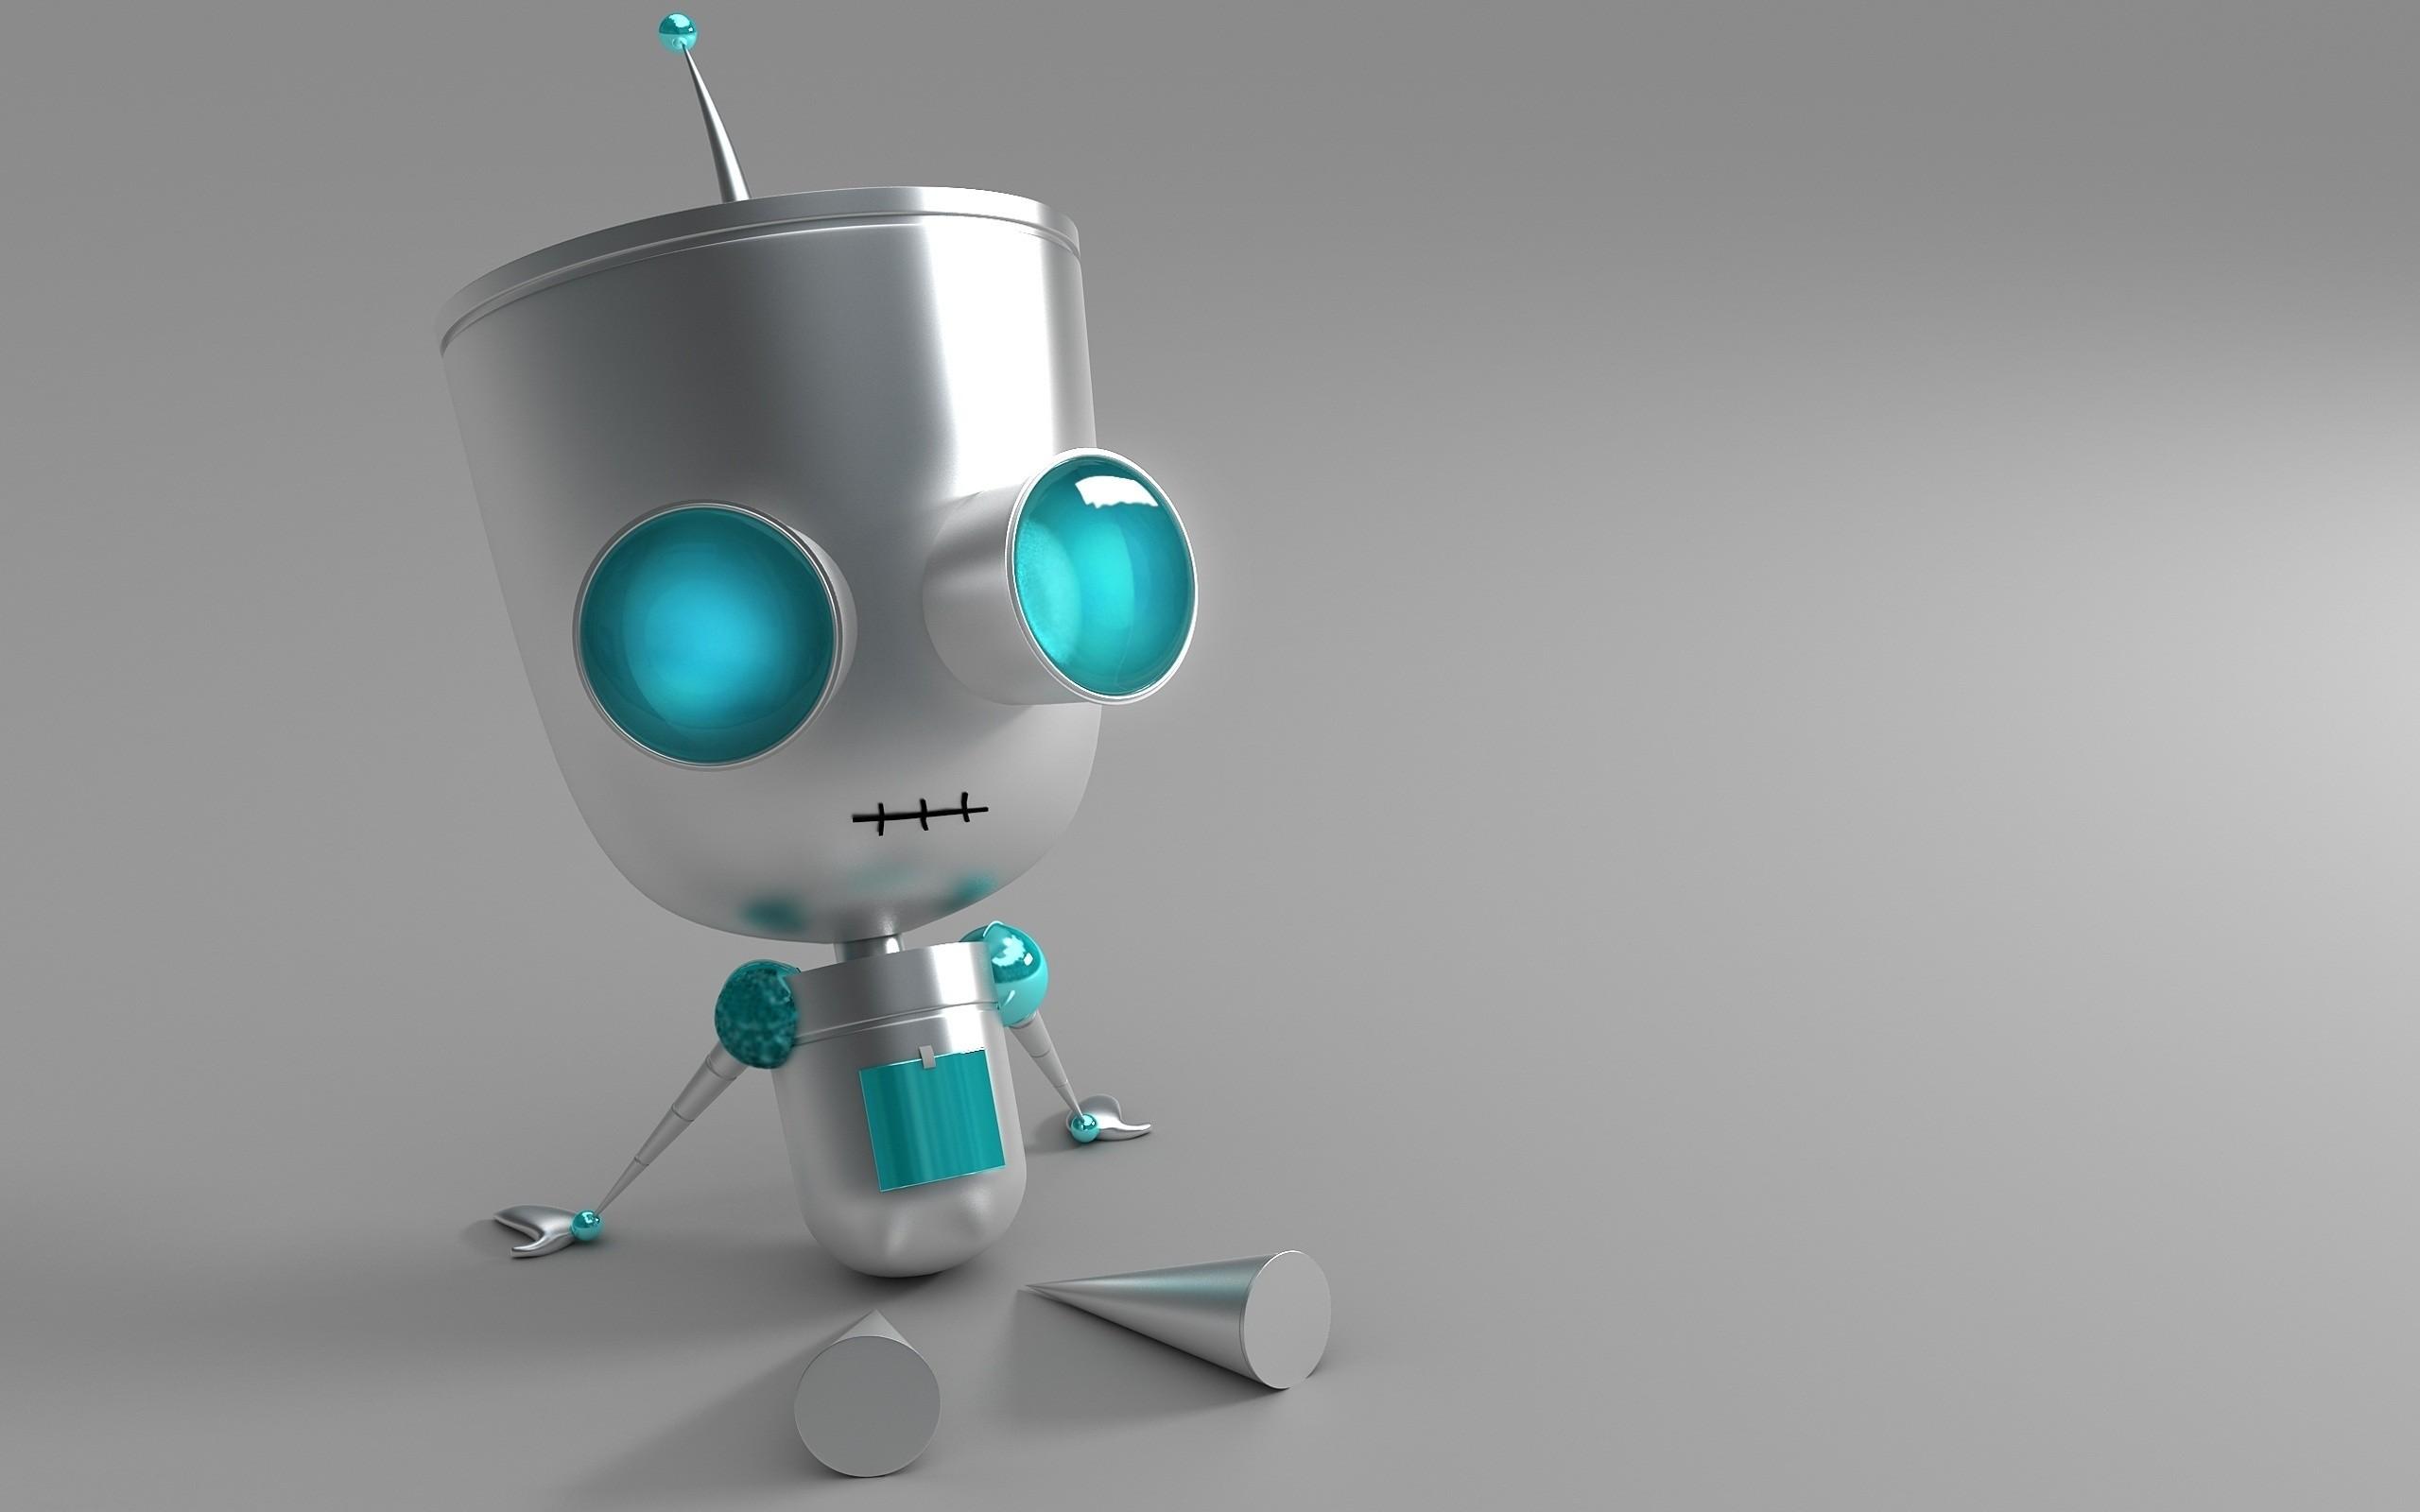 Cute Robot Wallpaper (71+ images)